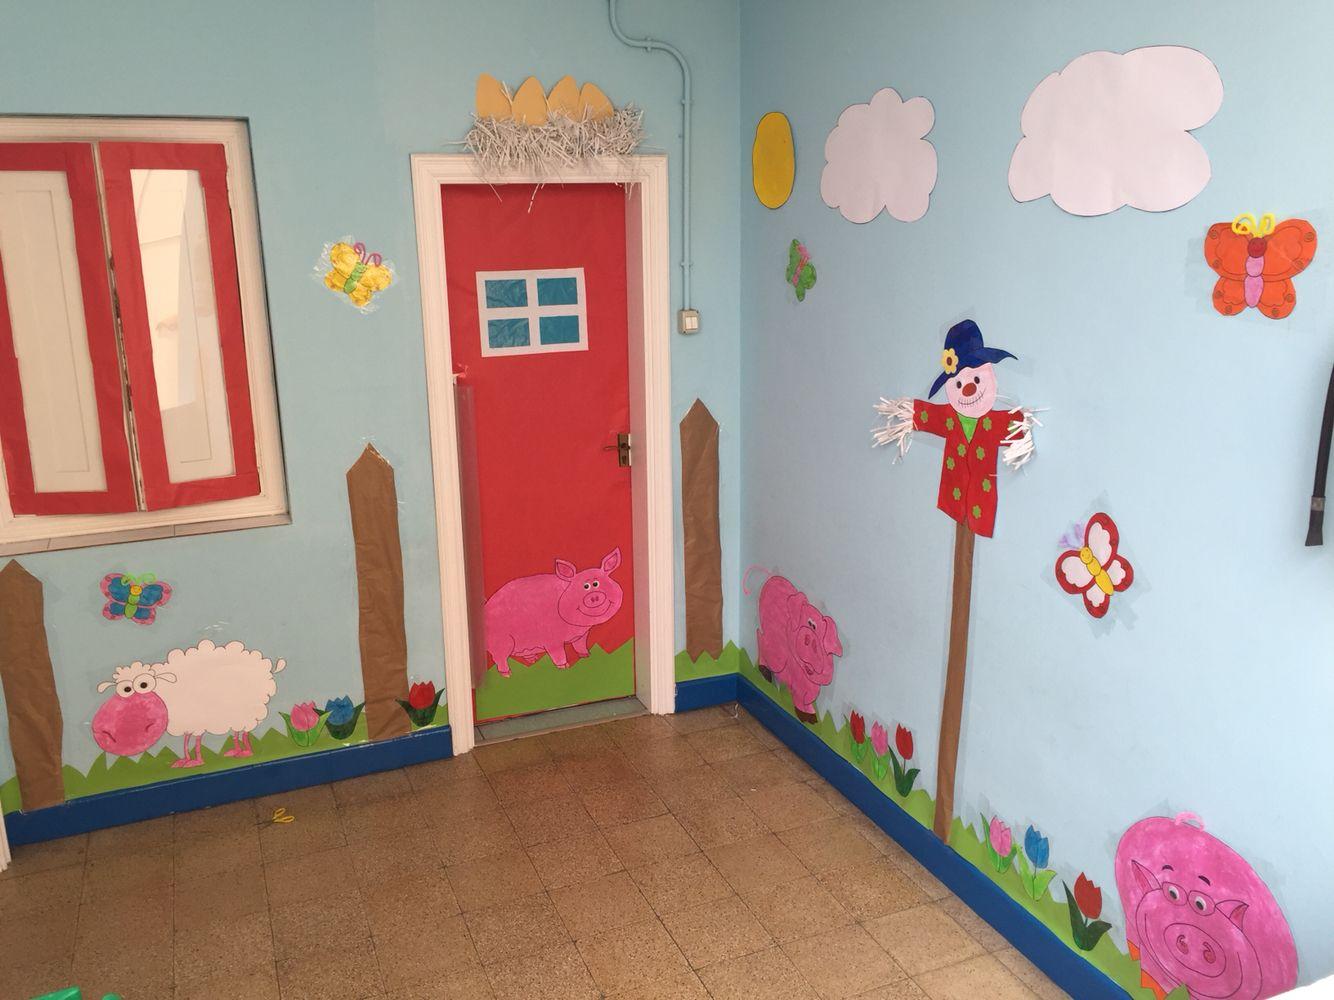 Decoraci n de la puerta proyecto de la granja ilan for Decoracion puerta aula infantil